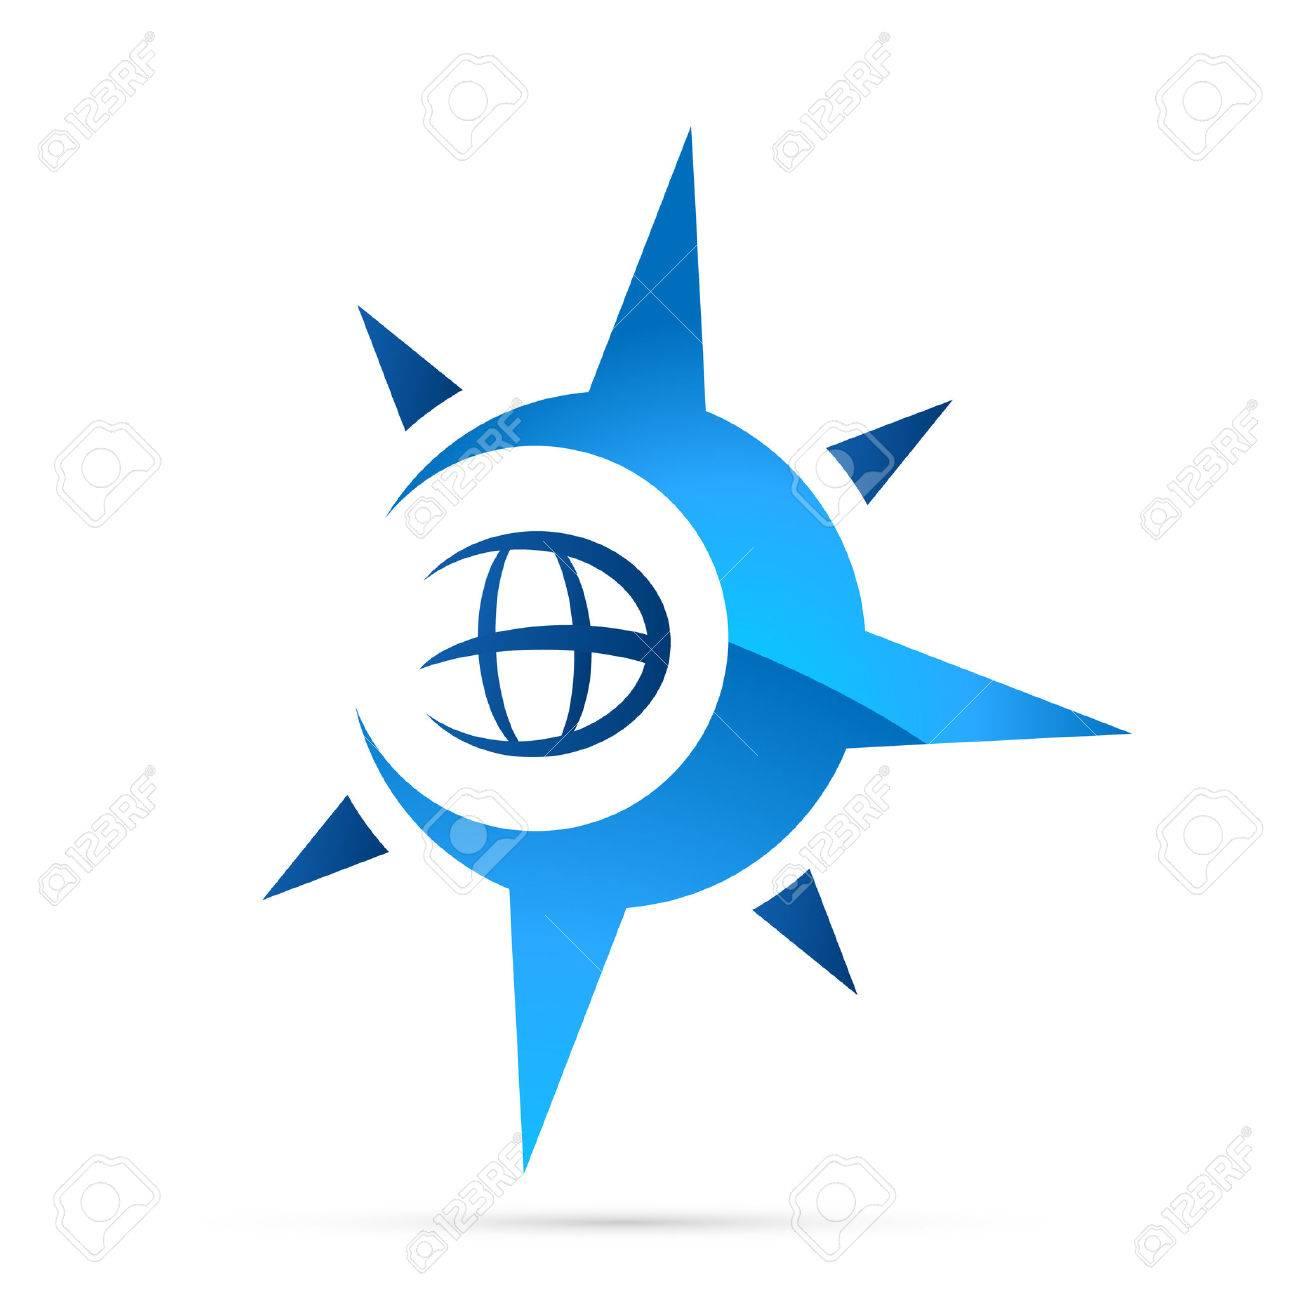 compass, navigation icon - 24908130